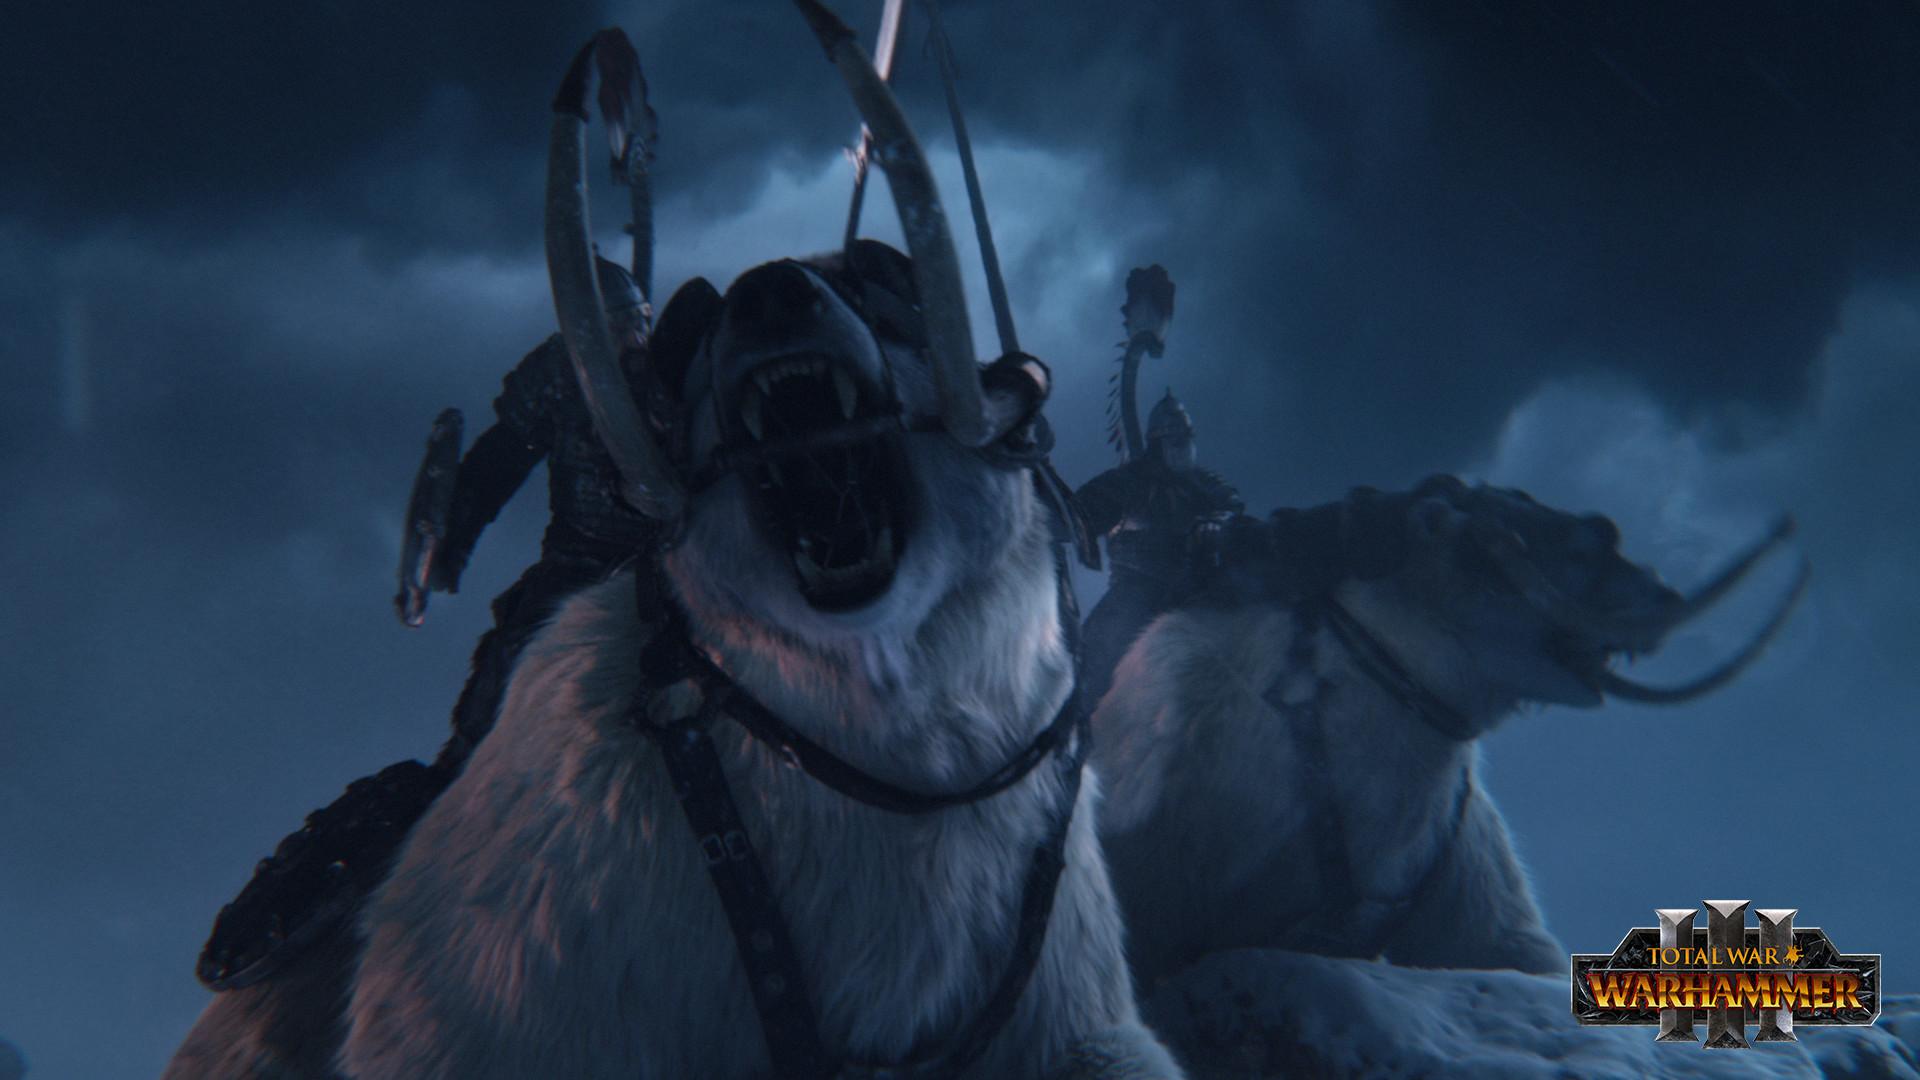 Total War: WARHAMMER III Fiyat Karşılaştırma